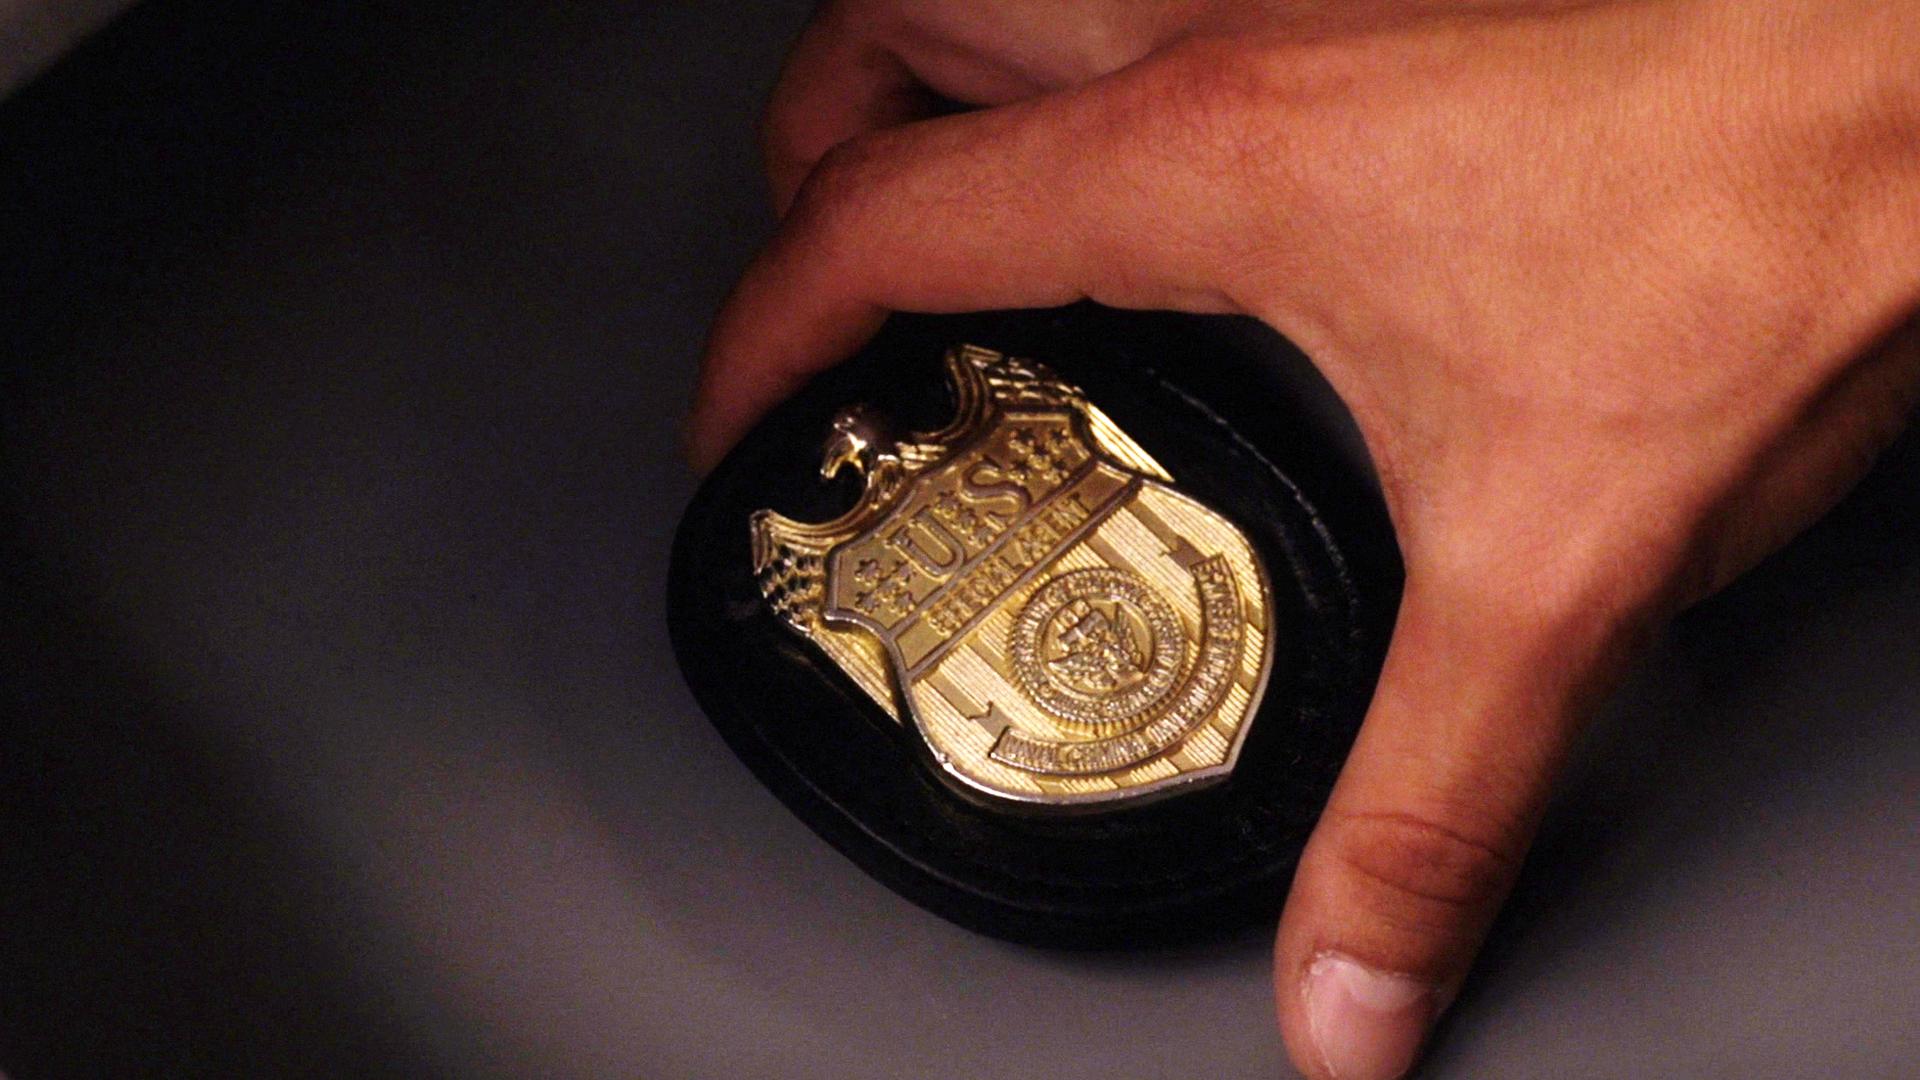 Gibbs gave him his badge back.